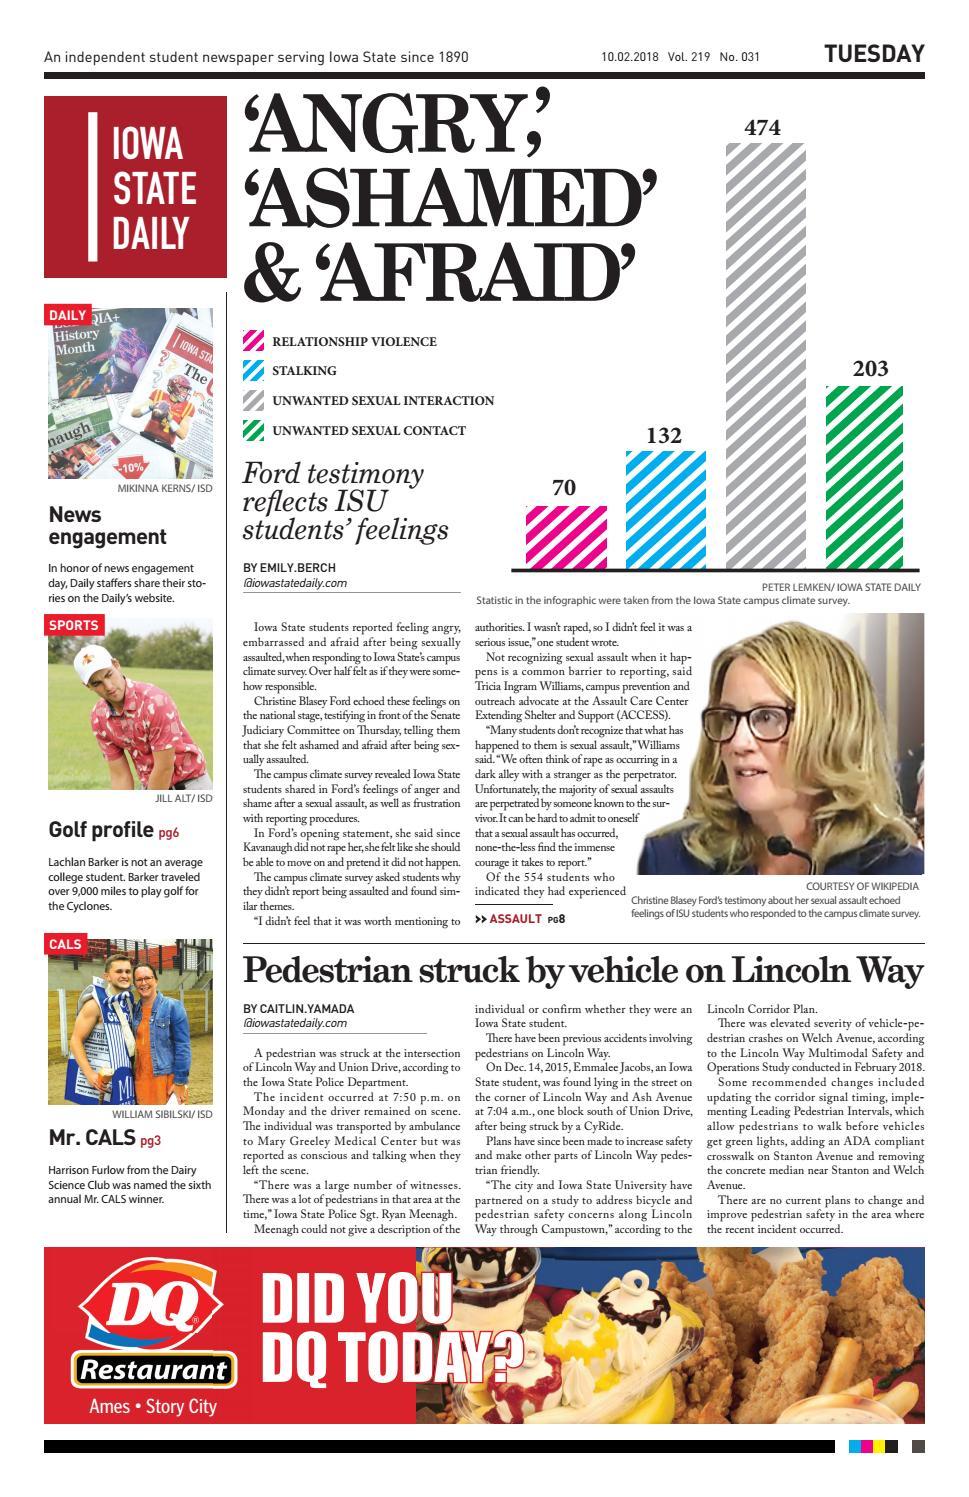 10 02 18 by Iowa State Daily - issuu